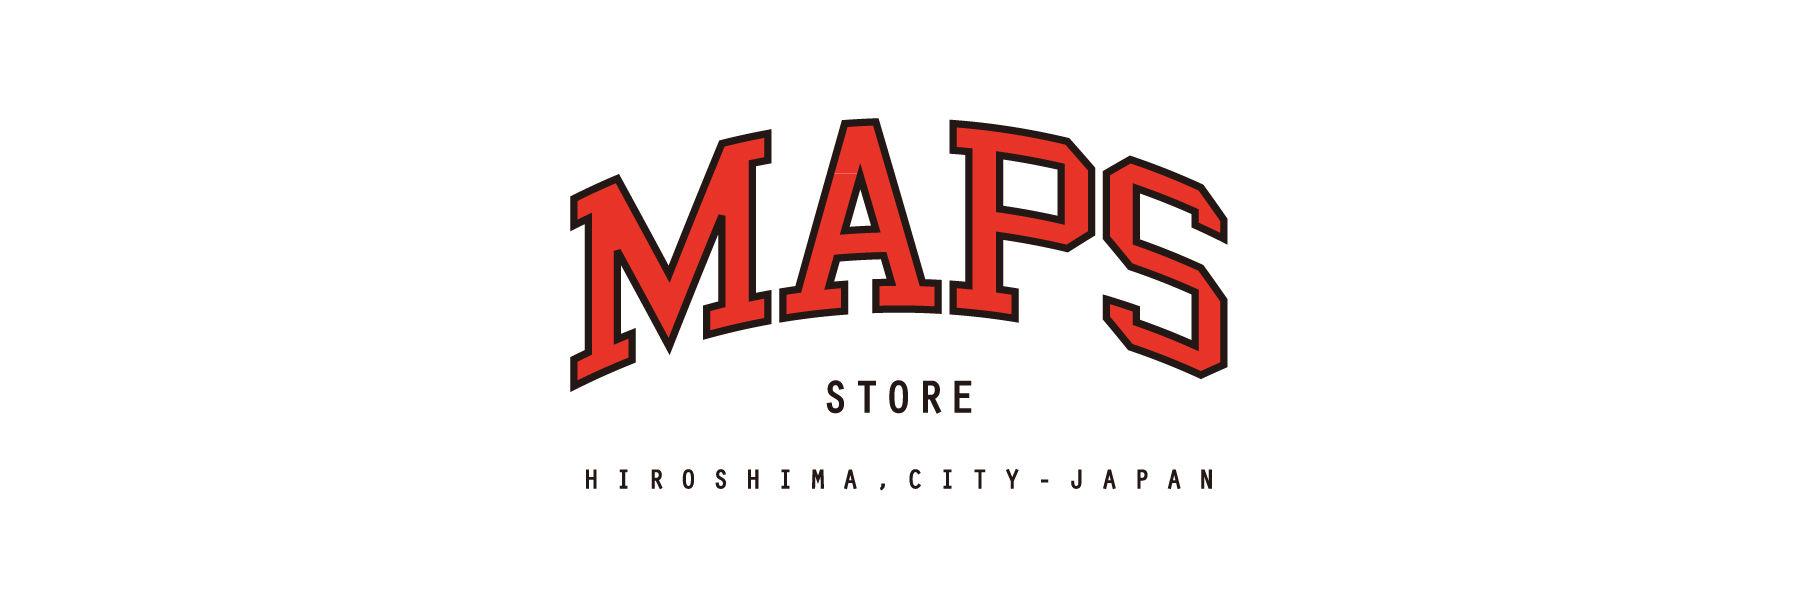 MAPS-Hiroshima